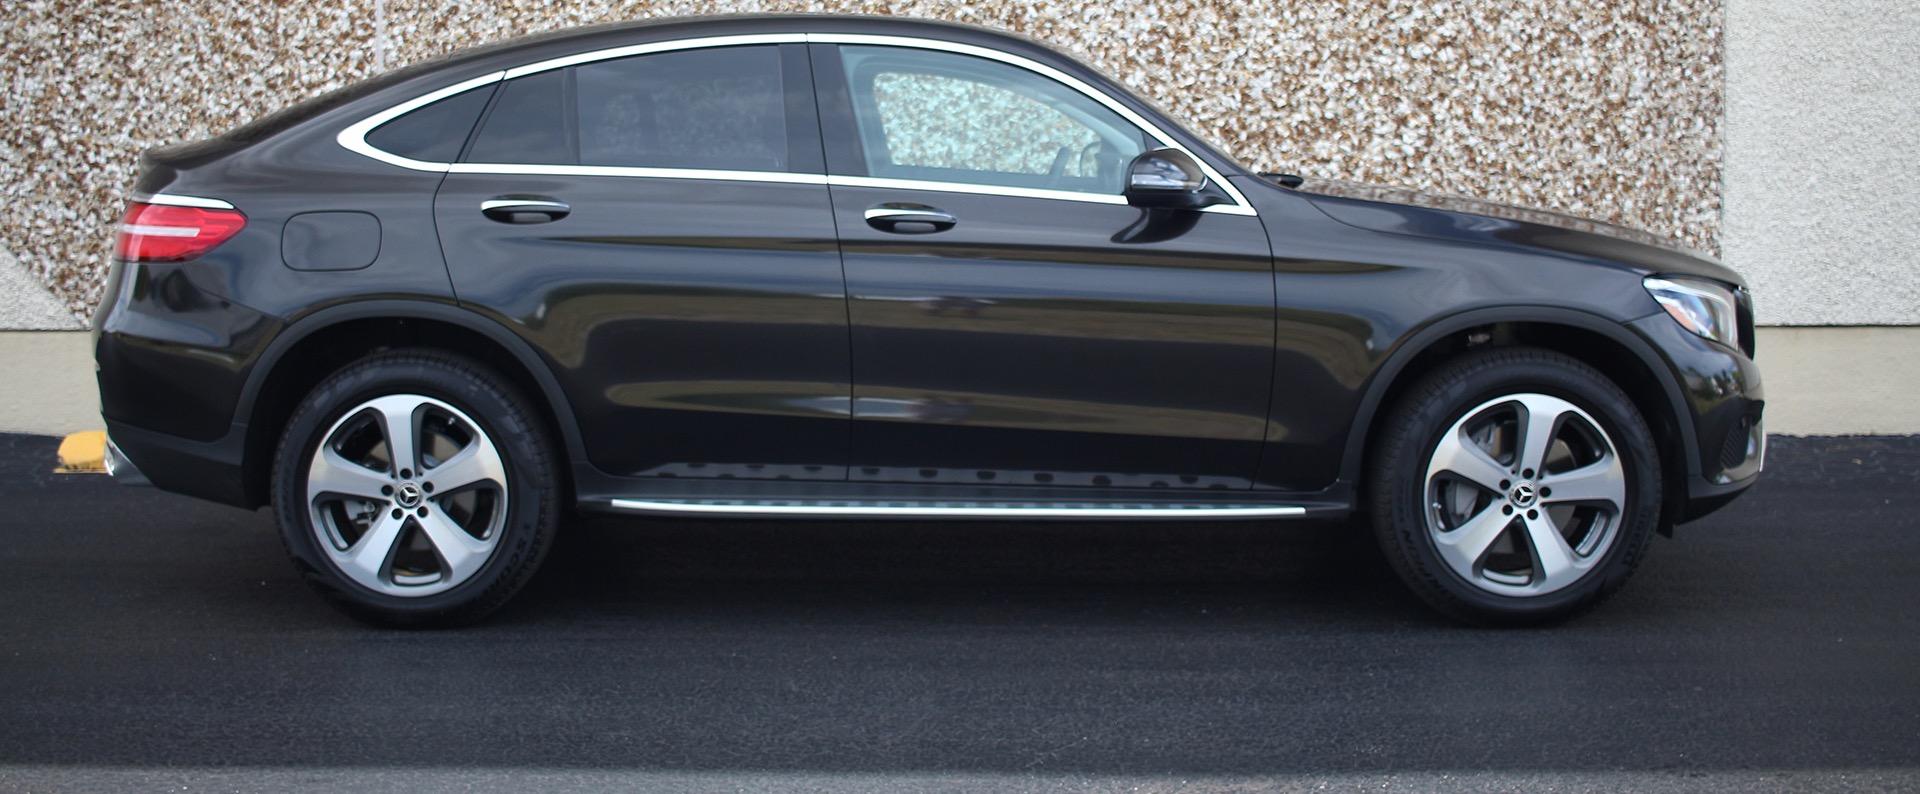 Used 2017 Mercedes-Benz GLC GLC 300 4MATIC | Miami, FL